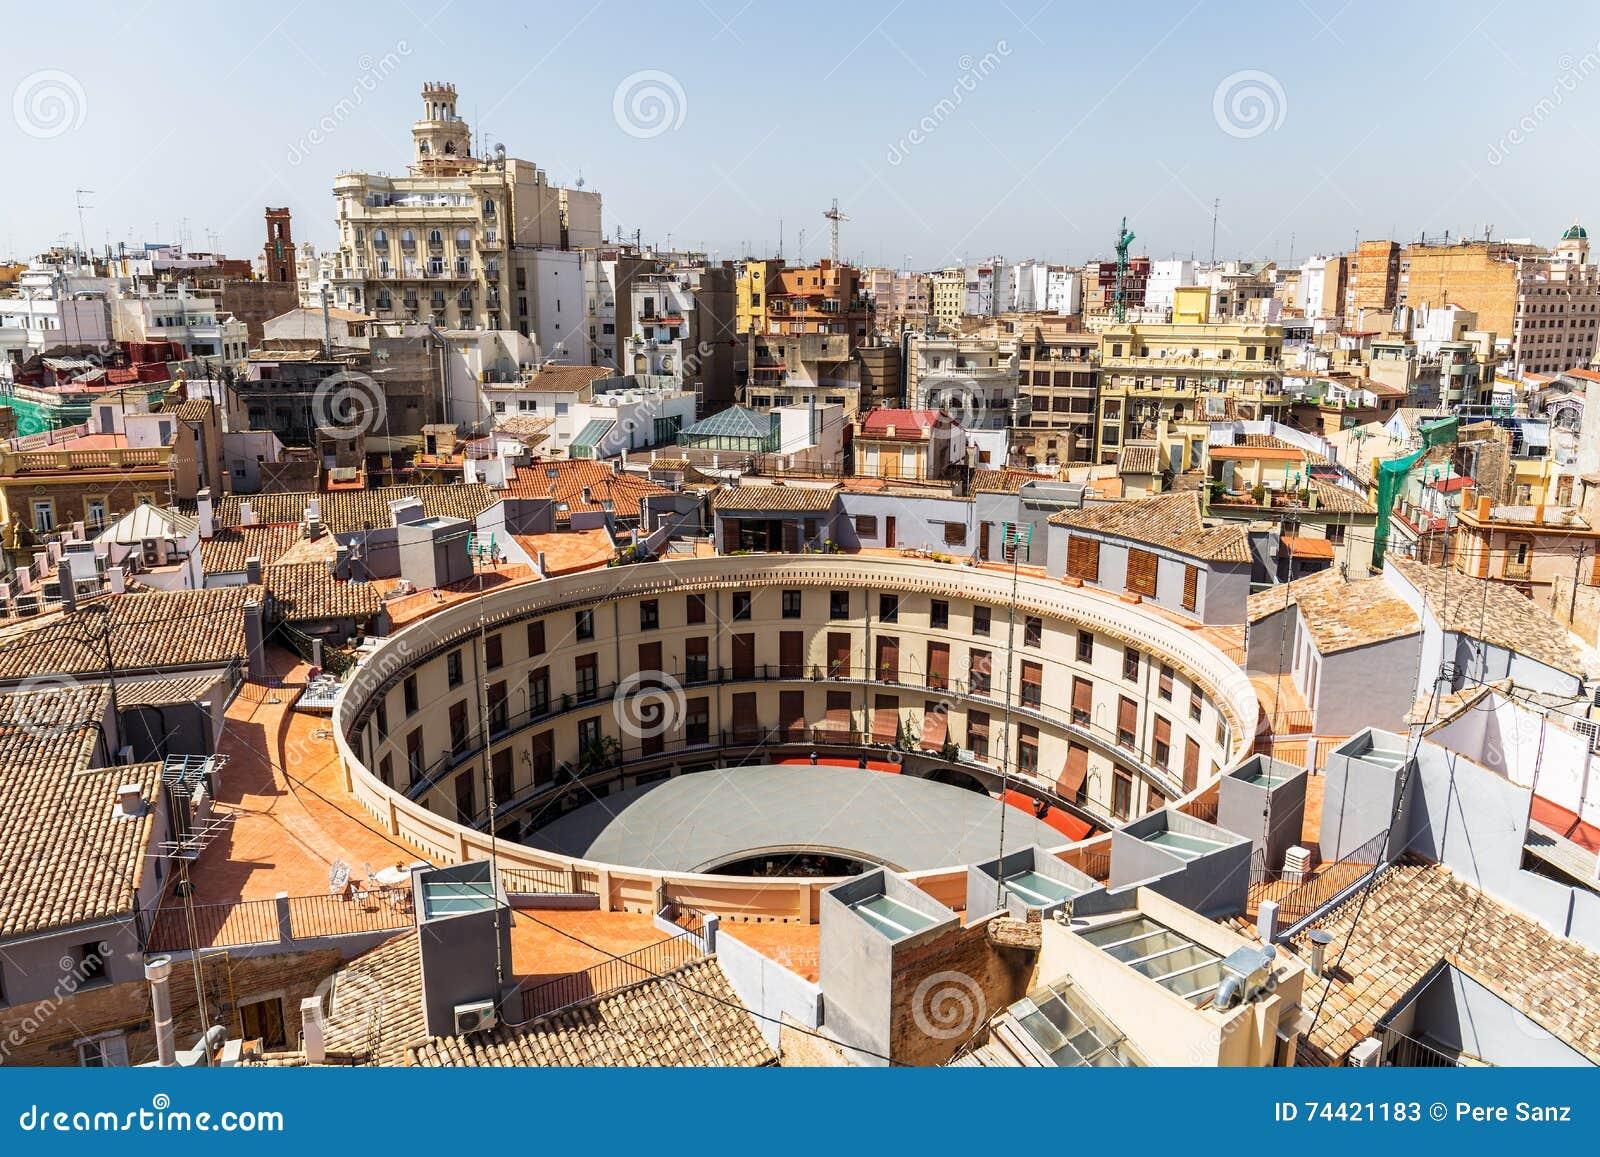 Aerial view of plaza redonda valencia spain stock image - Piscine valencia espagne ...